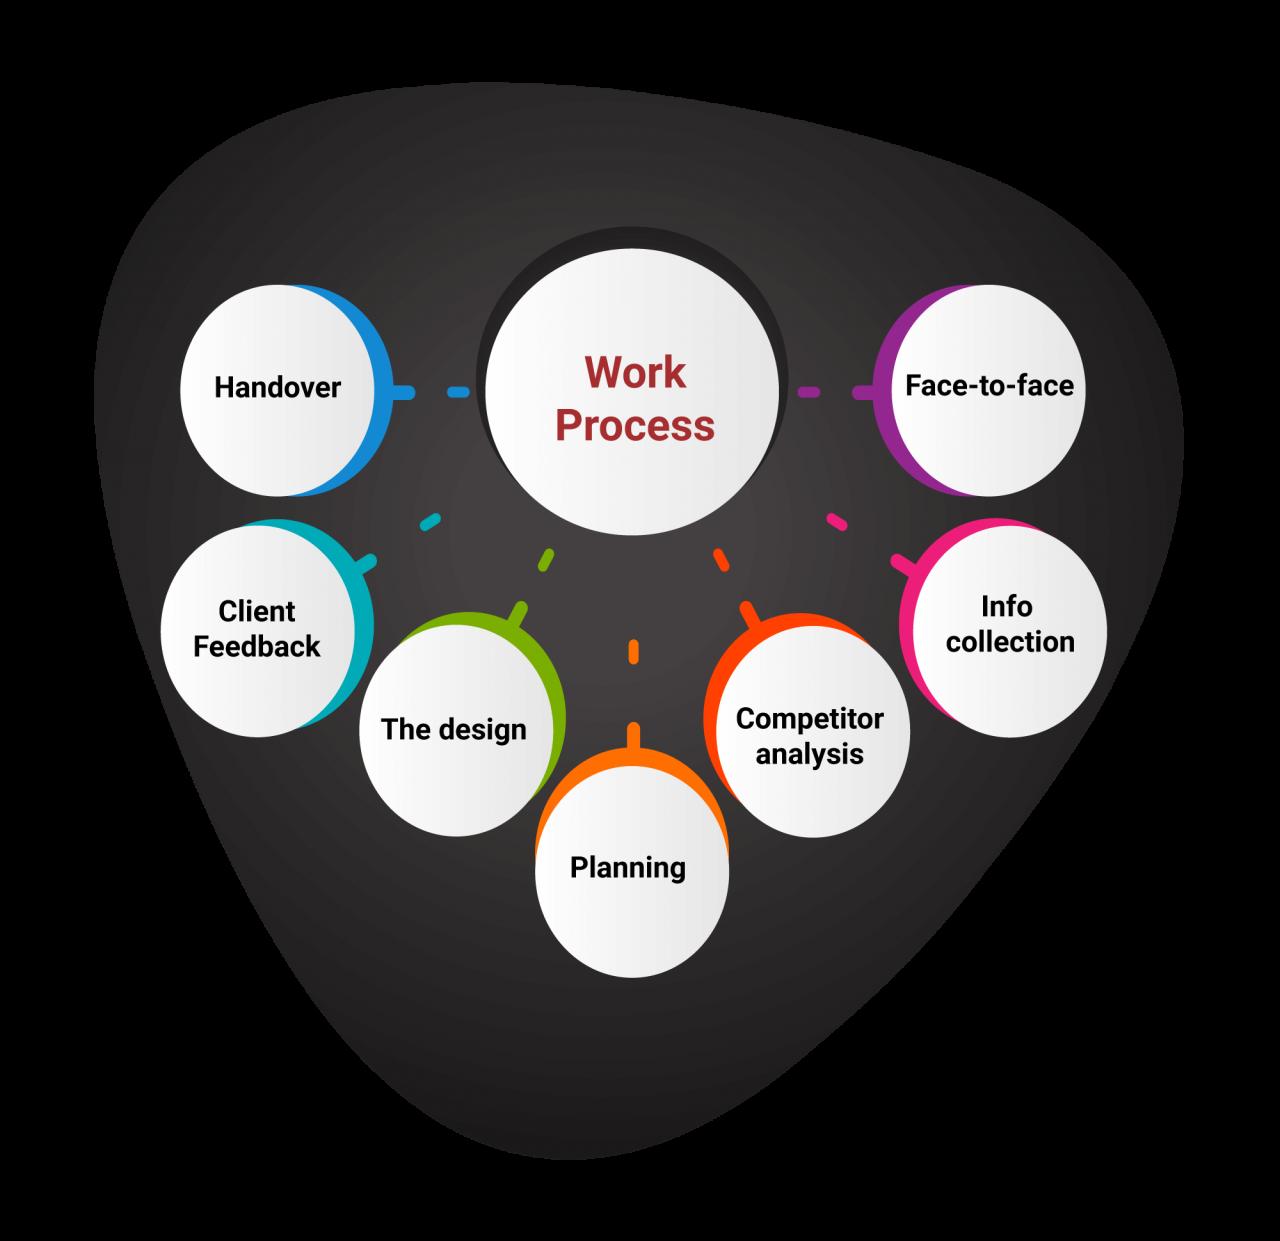 Web Design Work Process